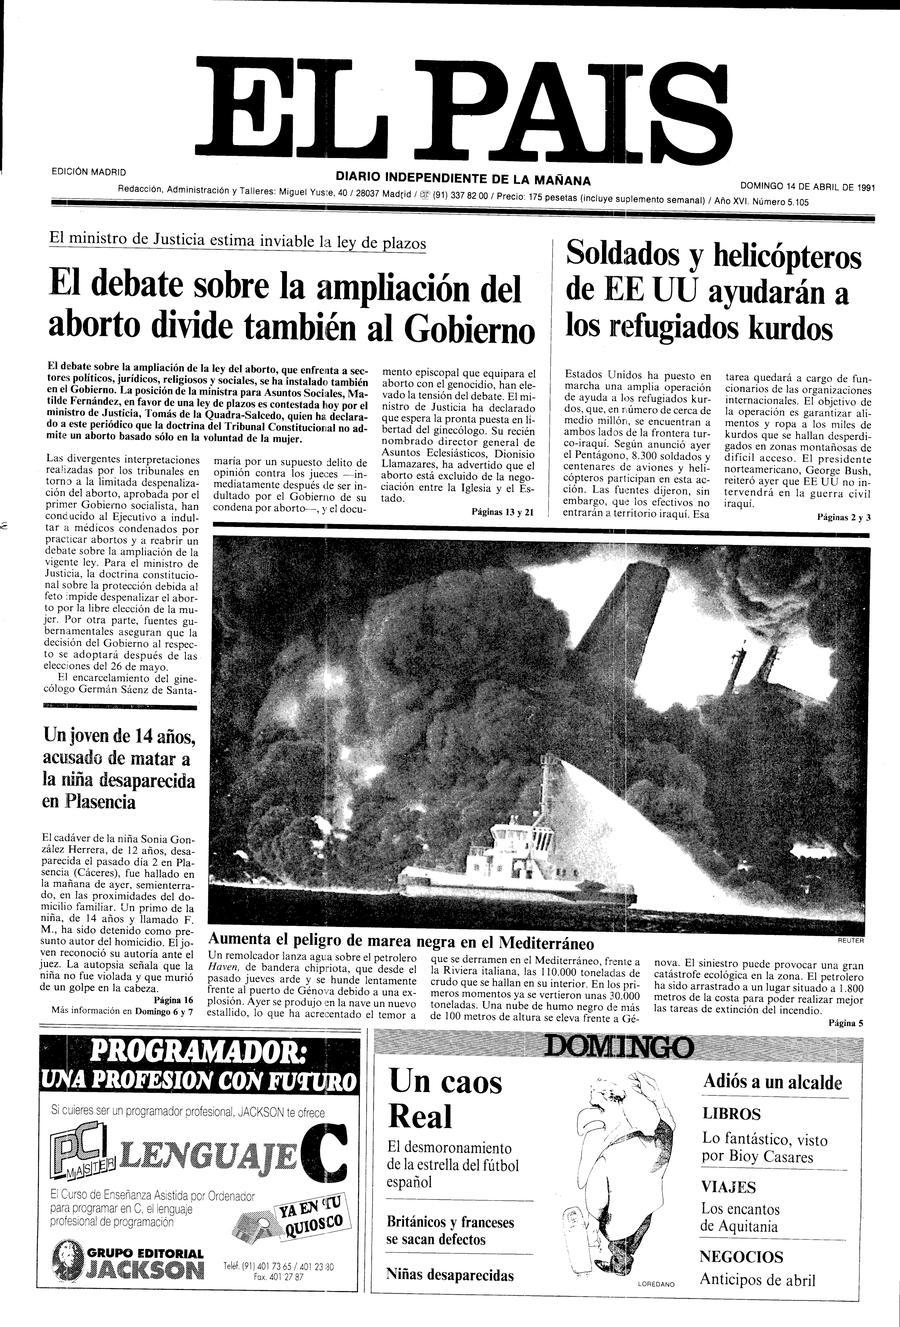 14 1986 de 25 de abril: